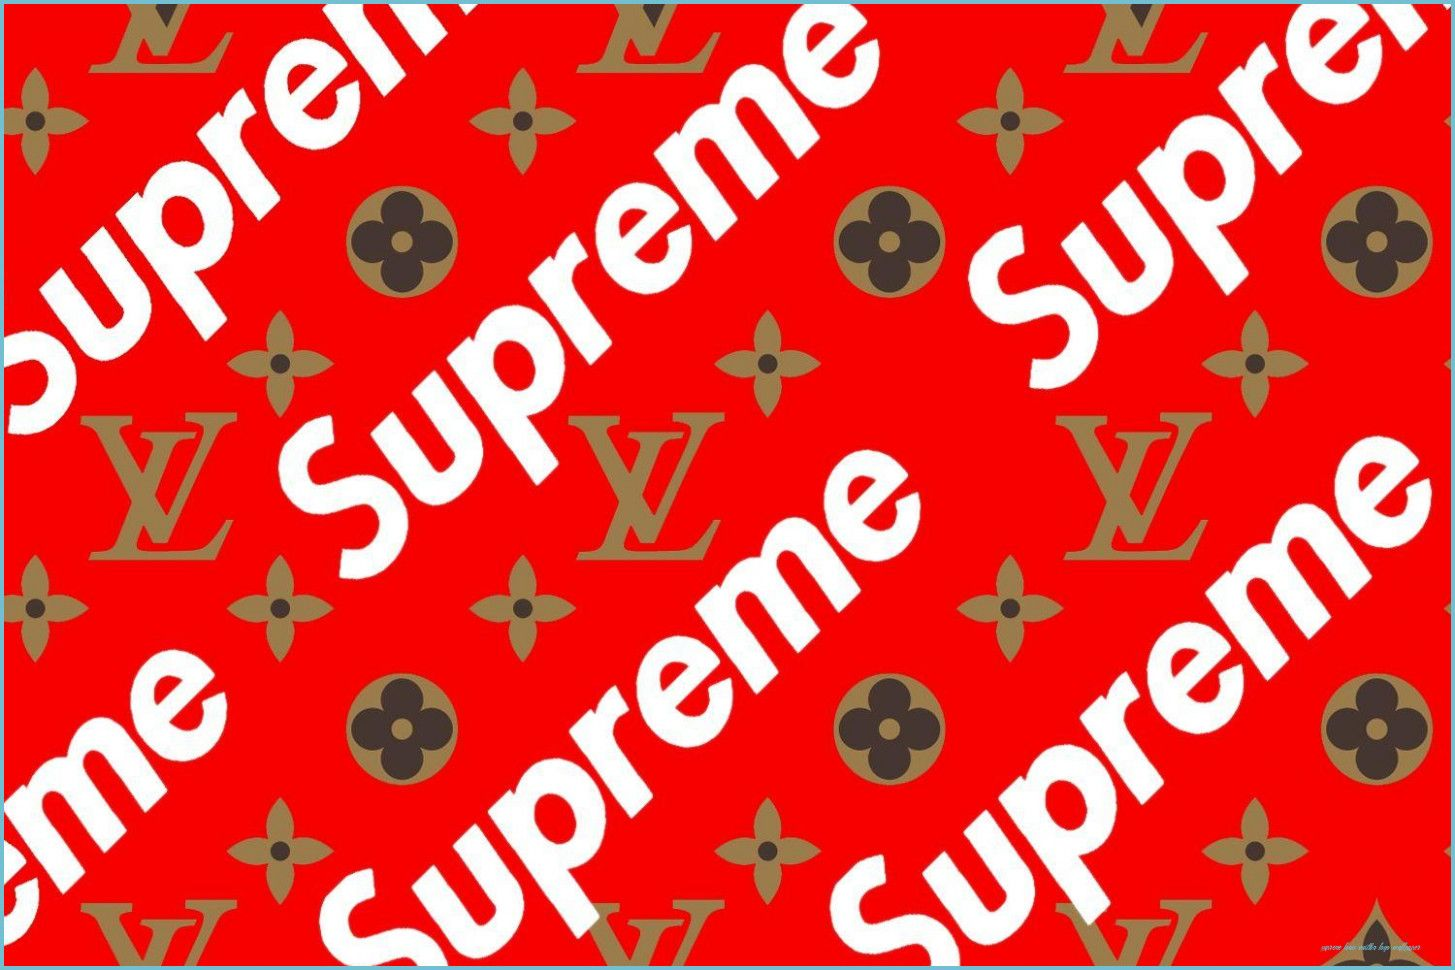 10 Mind Numbing Facts About Supreme Louis Vuitton Logo Wallpaper Supreme Louis Vuit Supreme Wallpaper Supreme Iphone Wallpaper Louis Vuitton Iphone Wallpaper